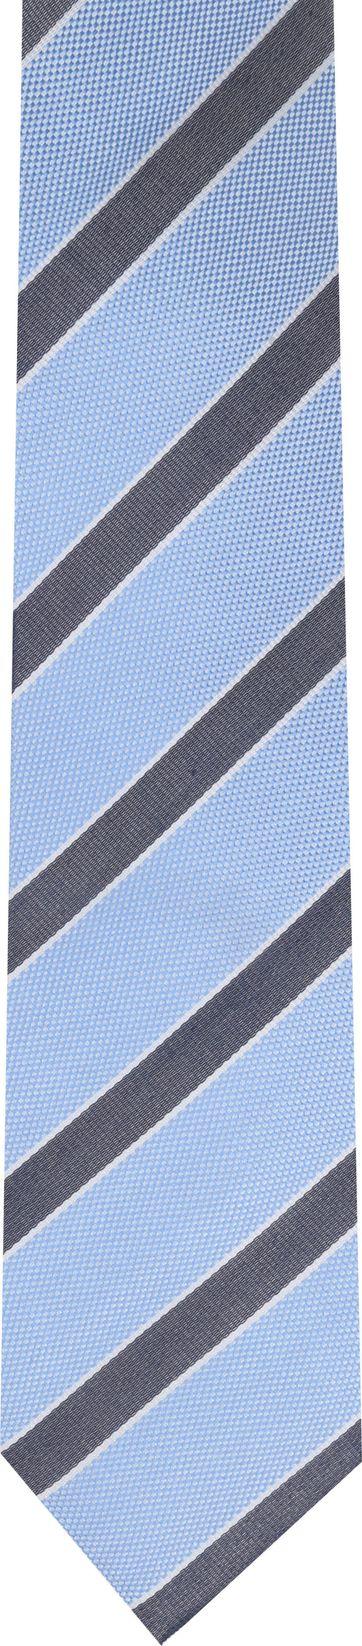 Suitable Krawatte Blau F01-27